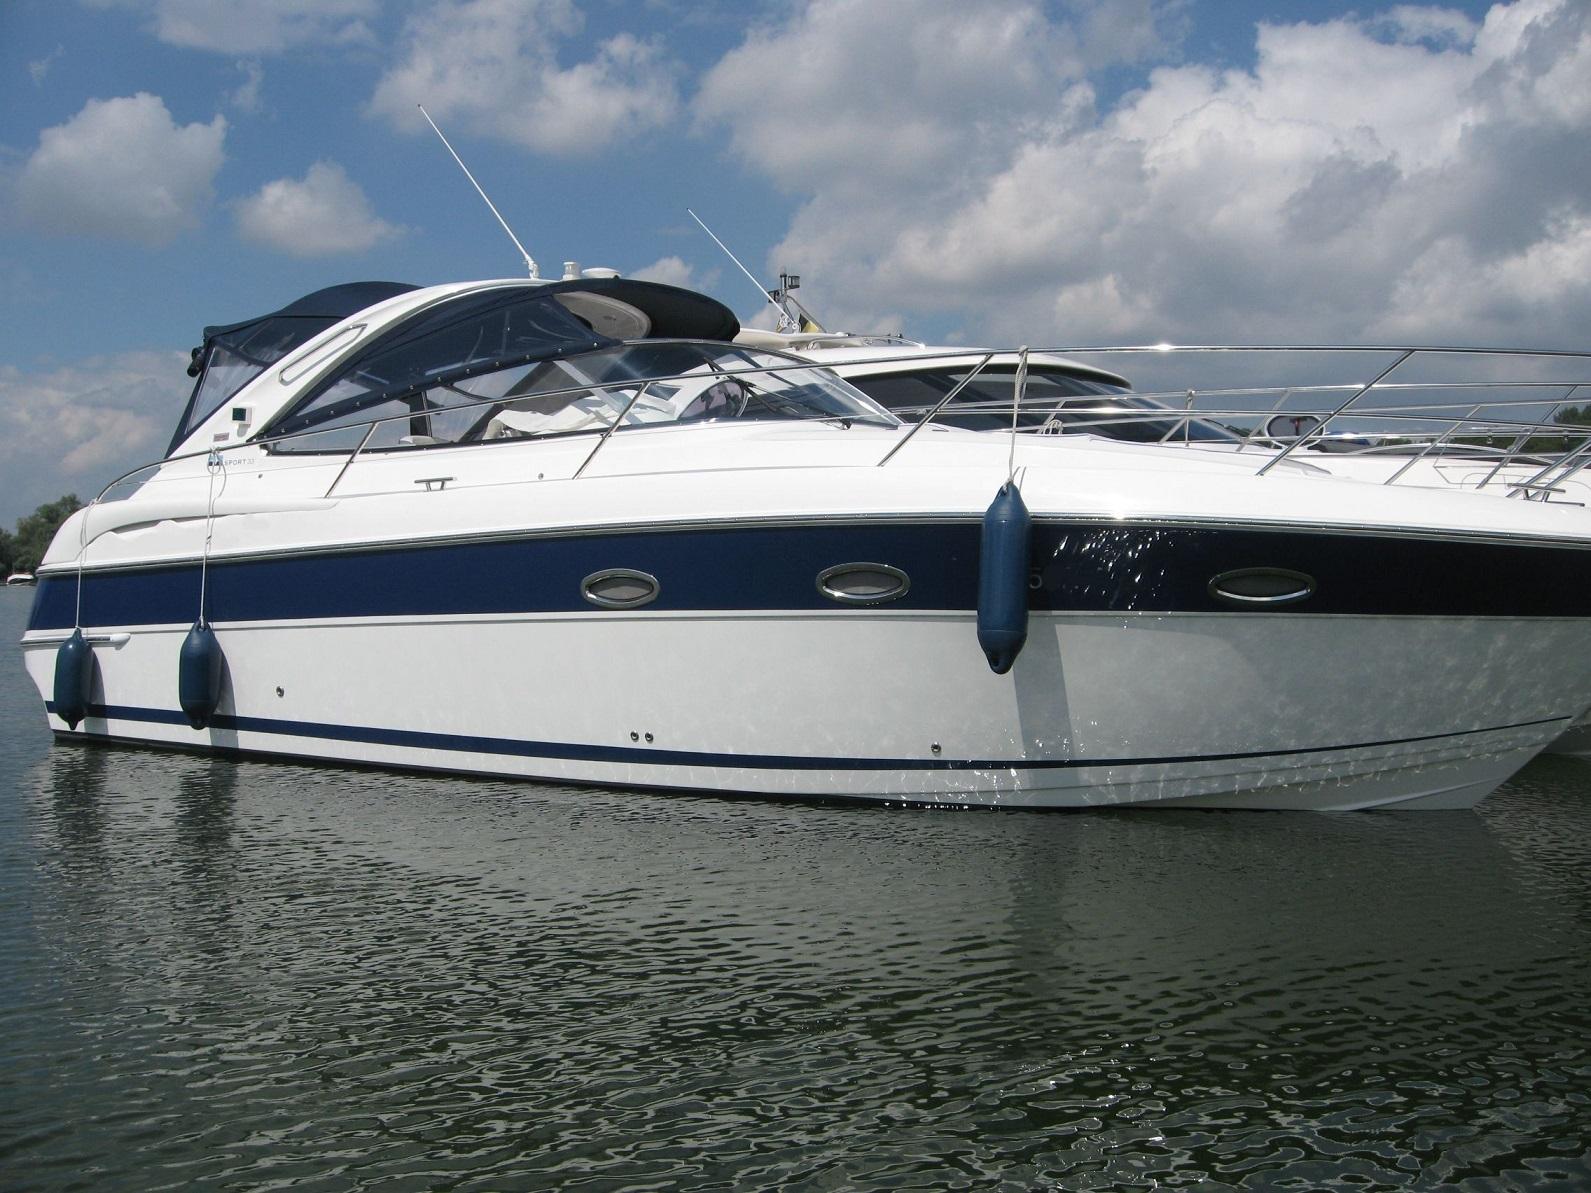 Yachtcharter 3618060557600575_Bavaria_sport_Stb